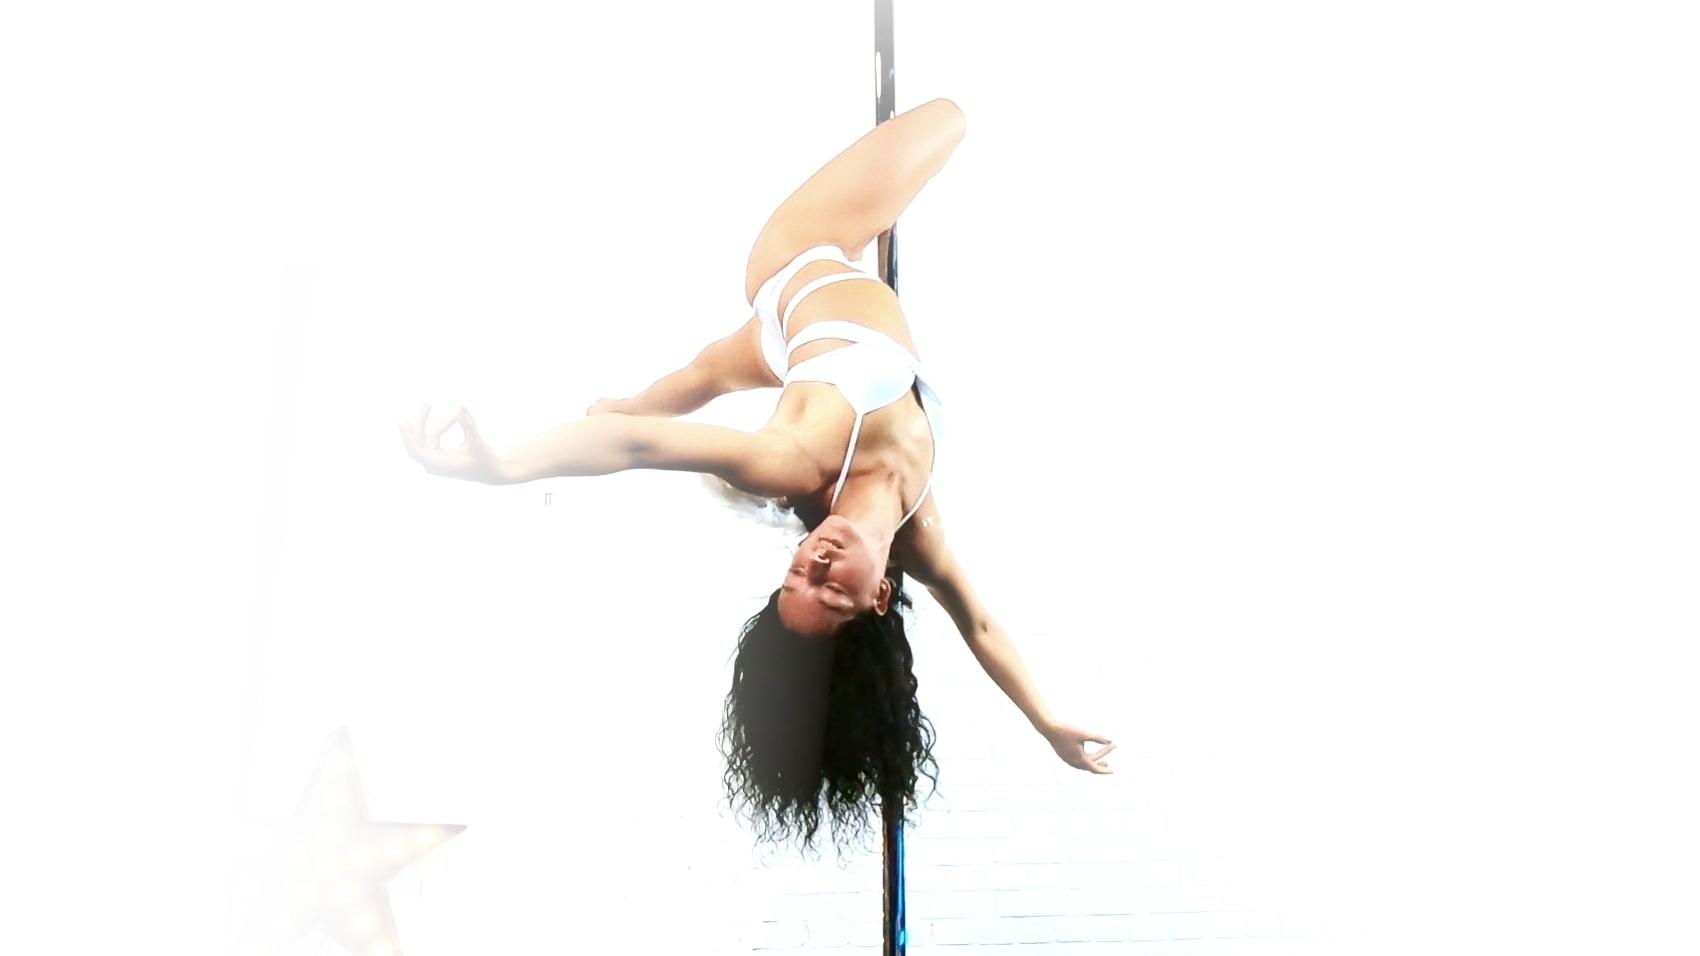 Artistic Pole